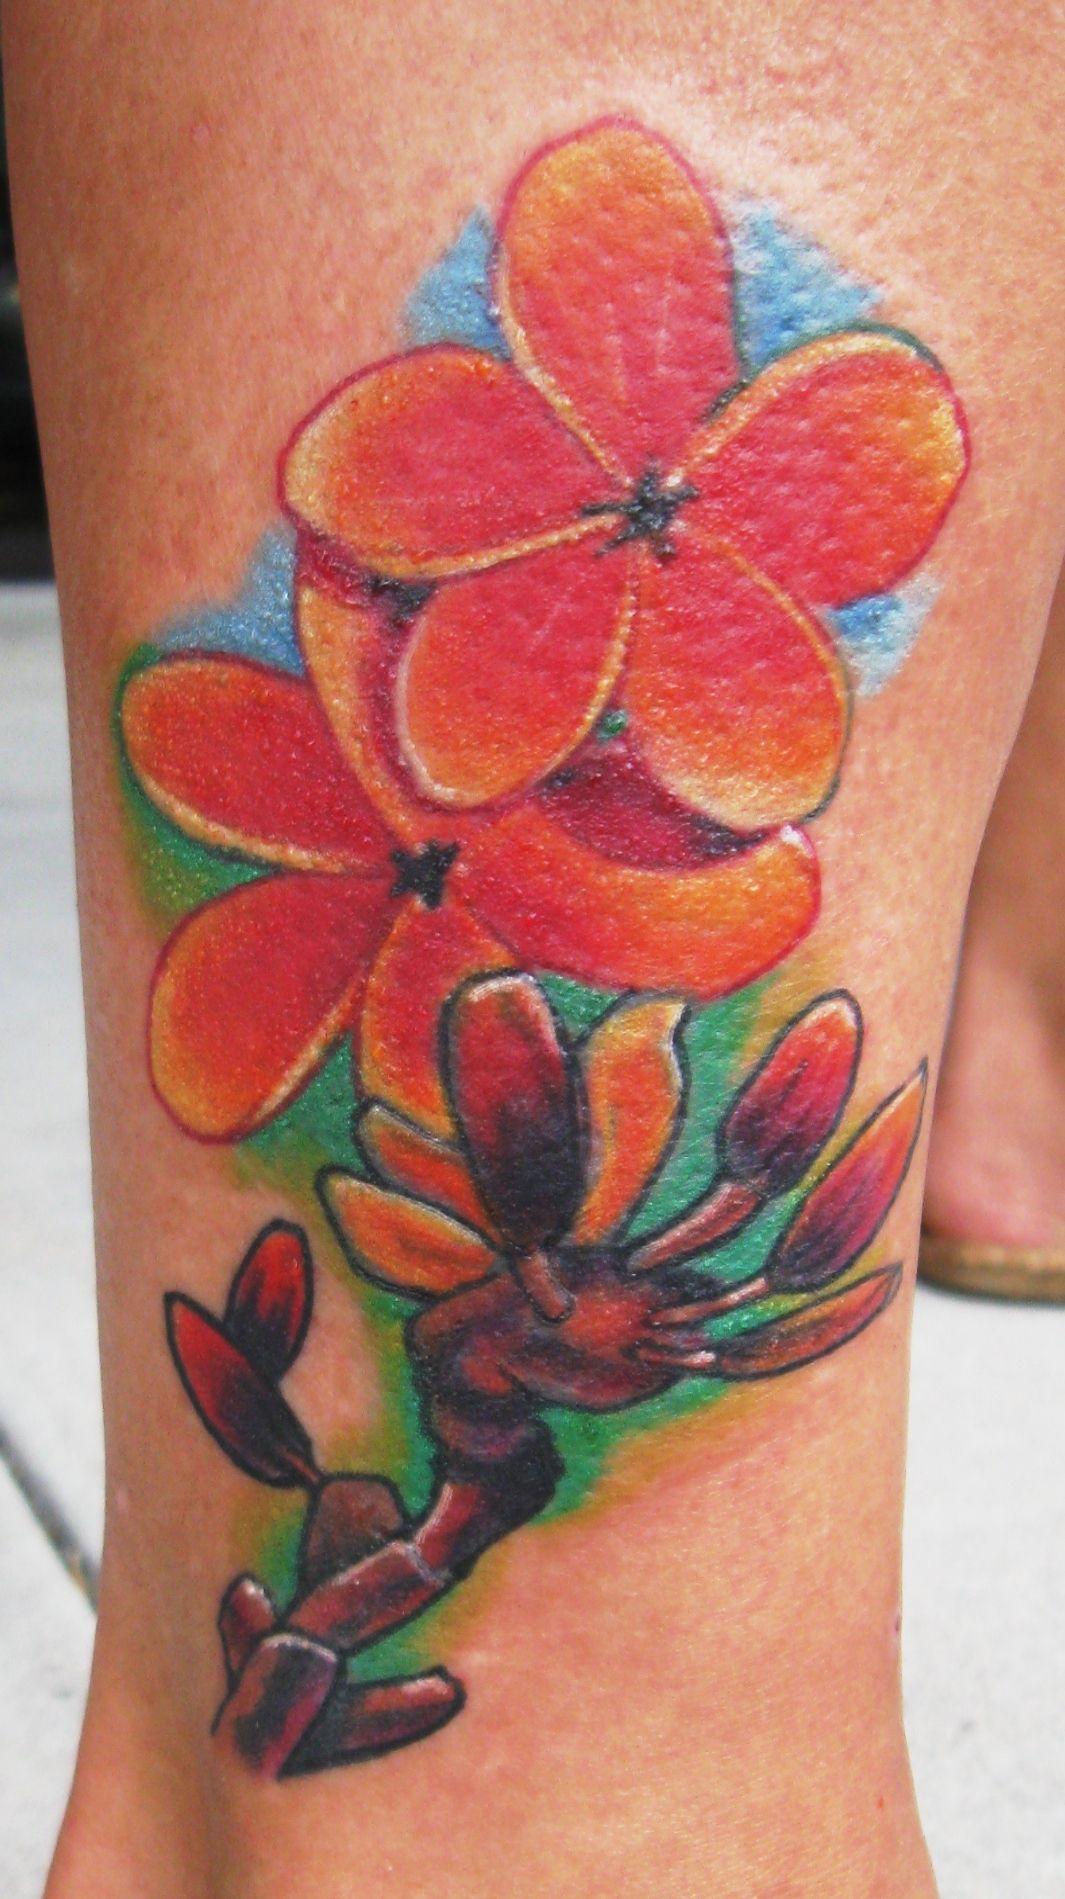 Hawaiian flower tattoo by derek raulerson tattoos hawaiianflower hawaiian flower tattoo by derek raulerson tattoos hawaiianflower hawaiianflowertattoo tattoosforwomen feminine flower izmirmasajfo